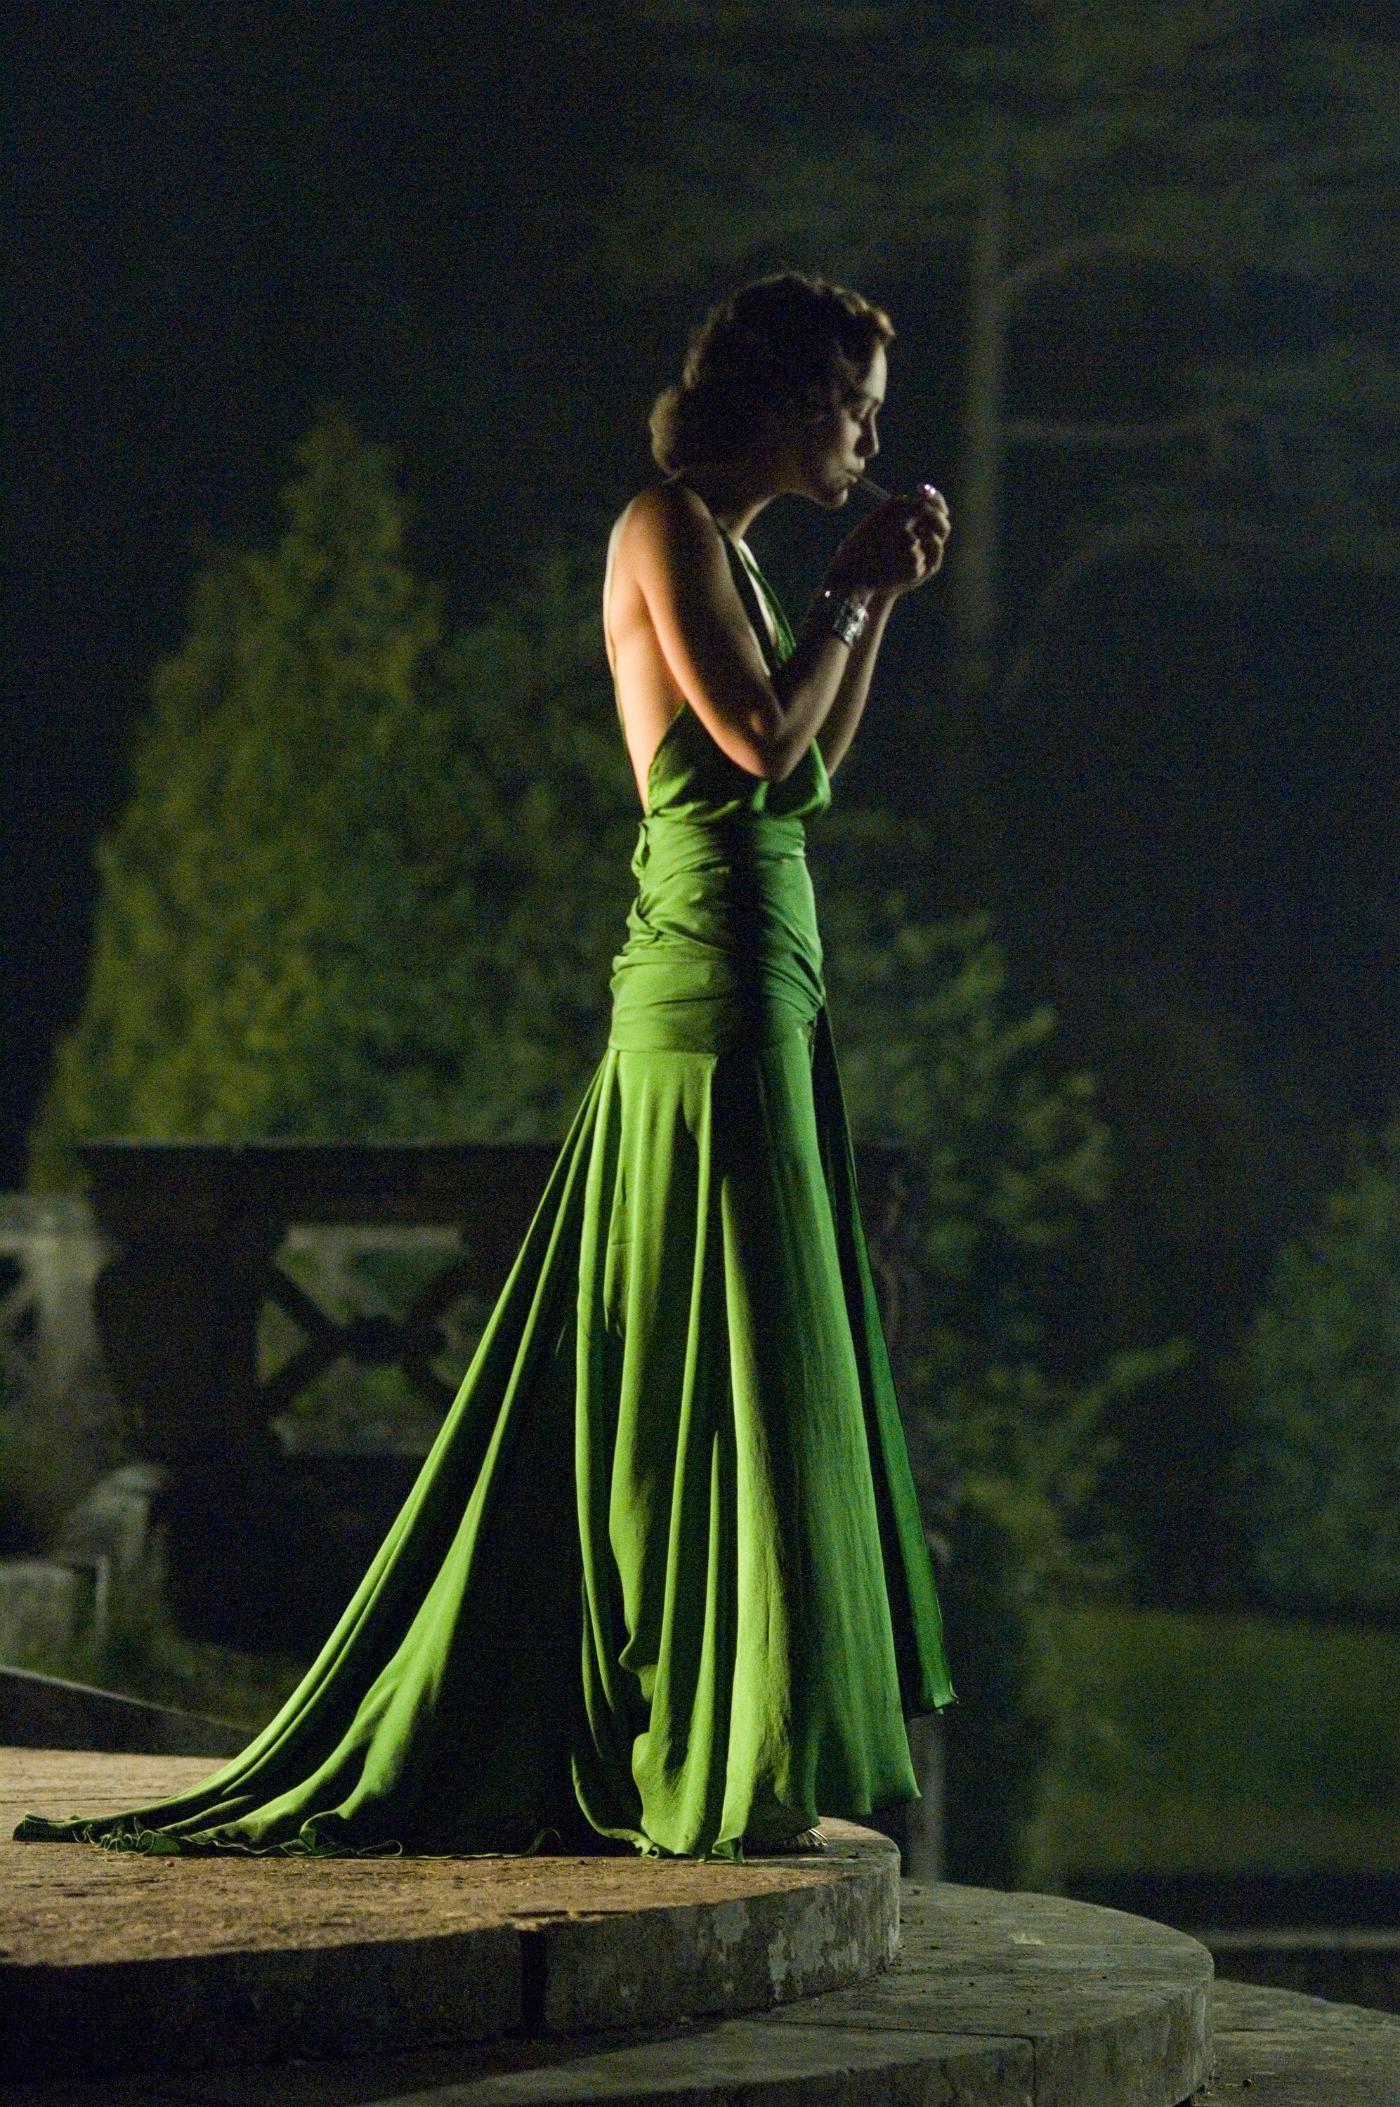 keira knightley green dress